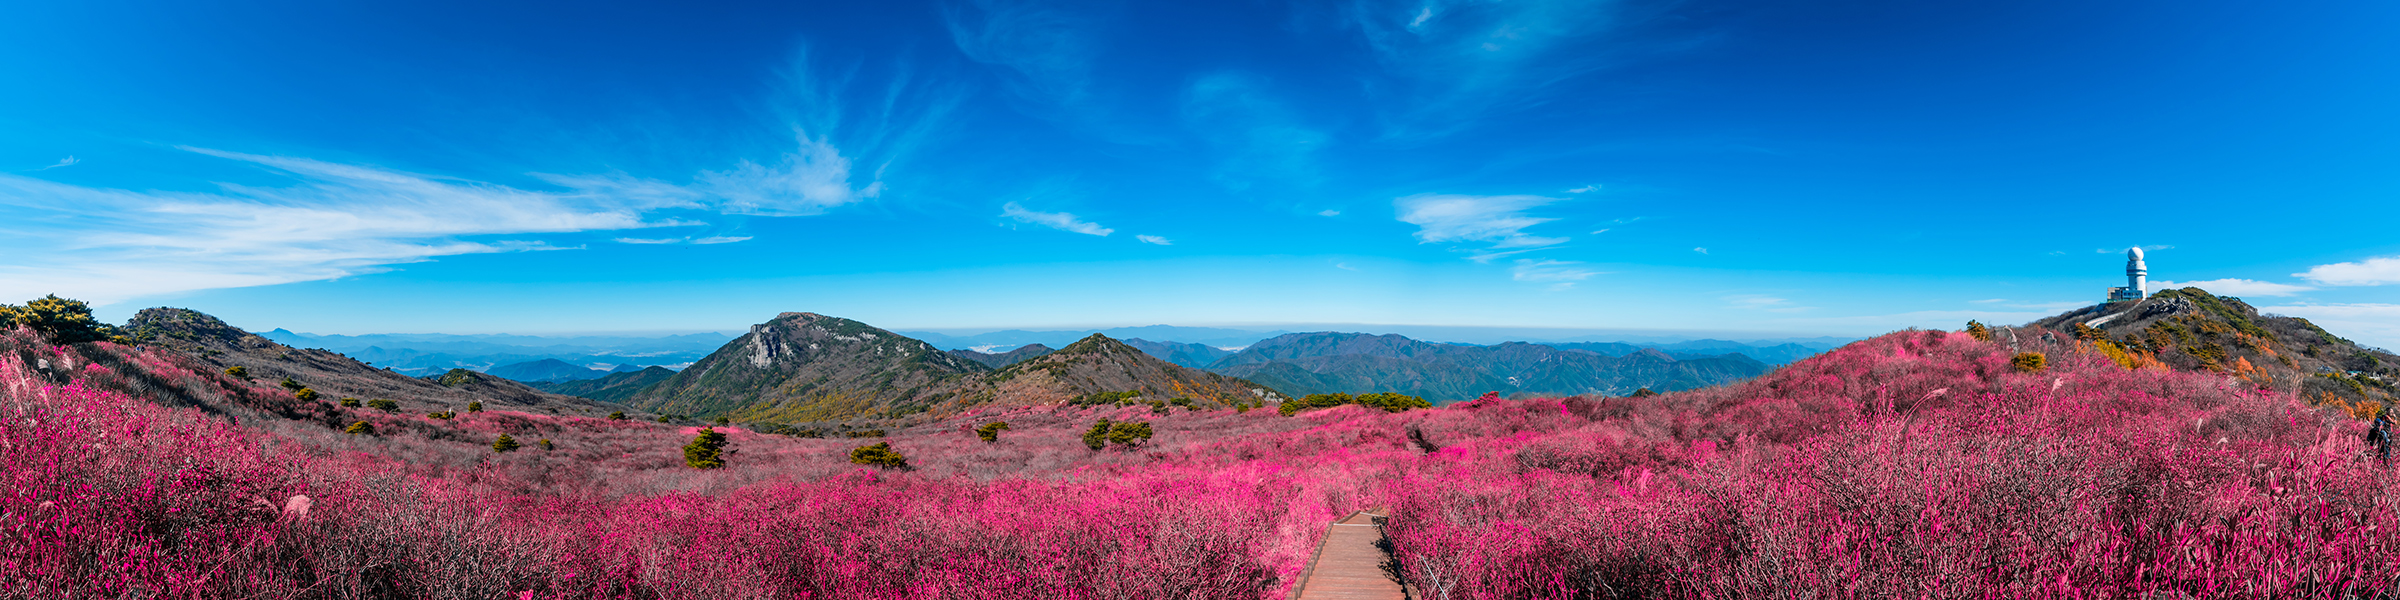 South Korea Biseulsan Mountain